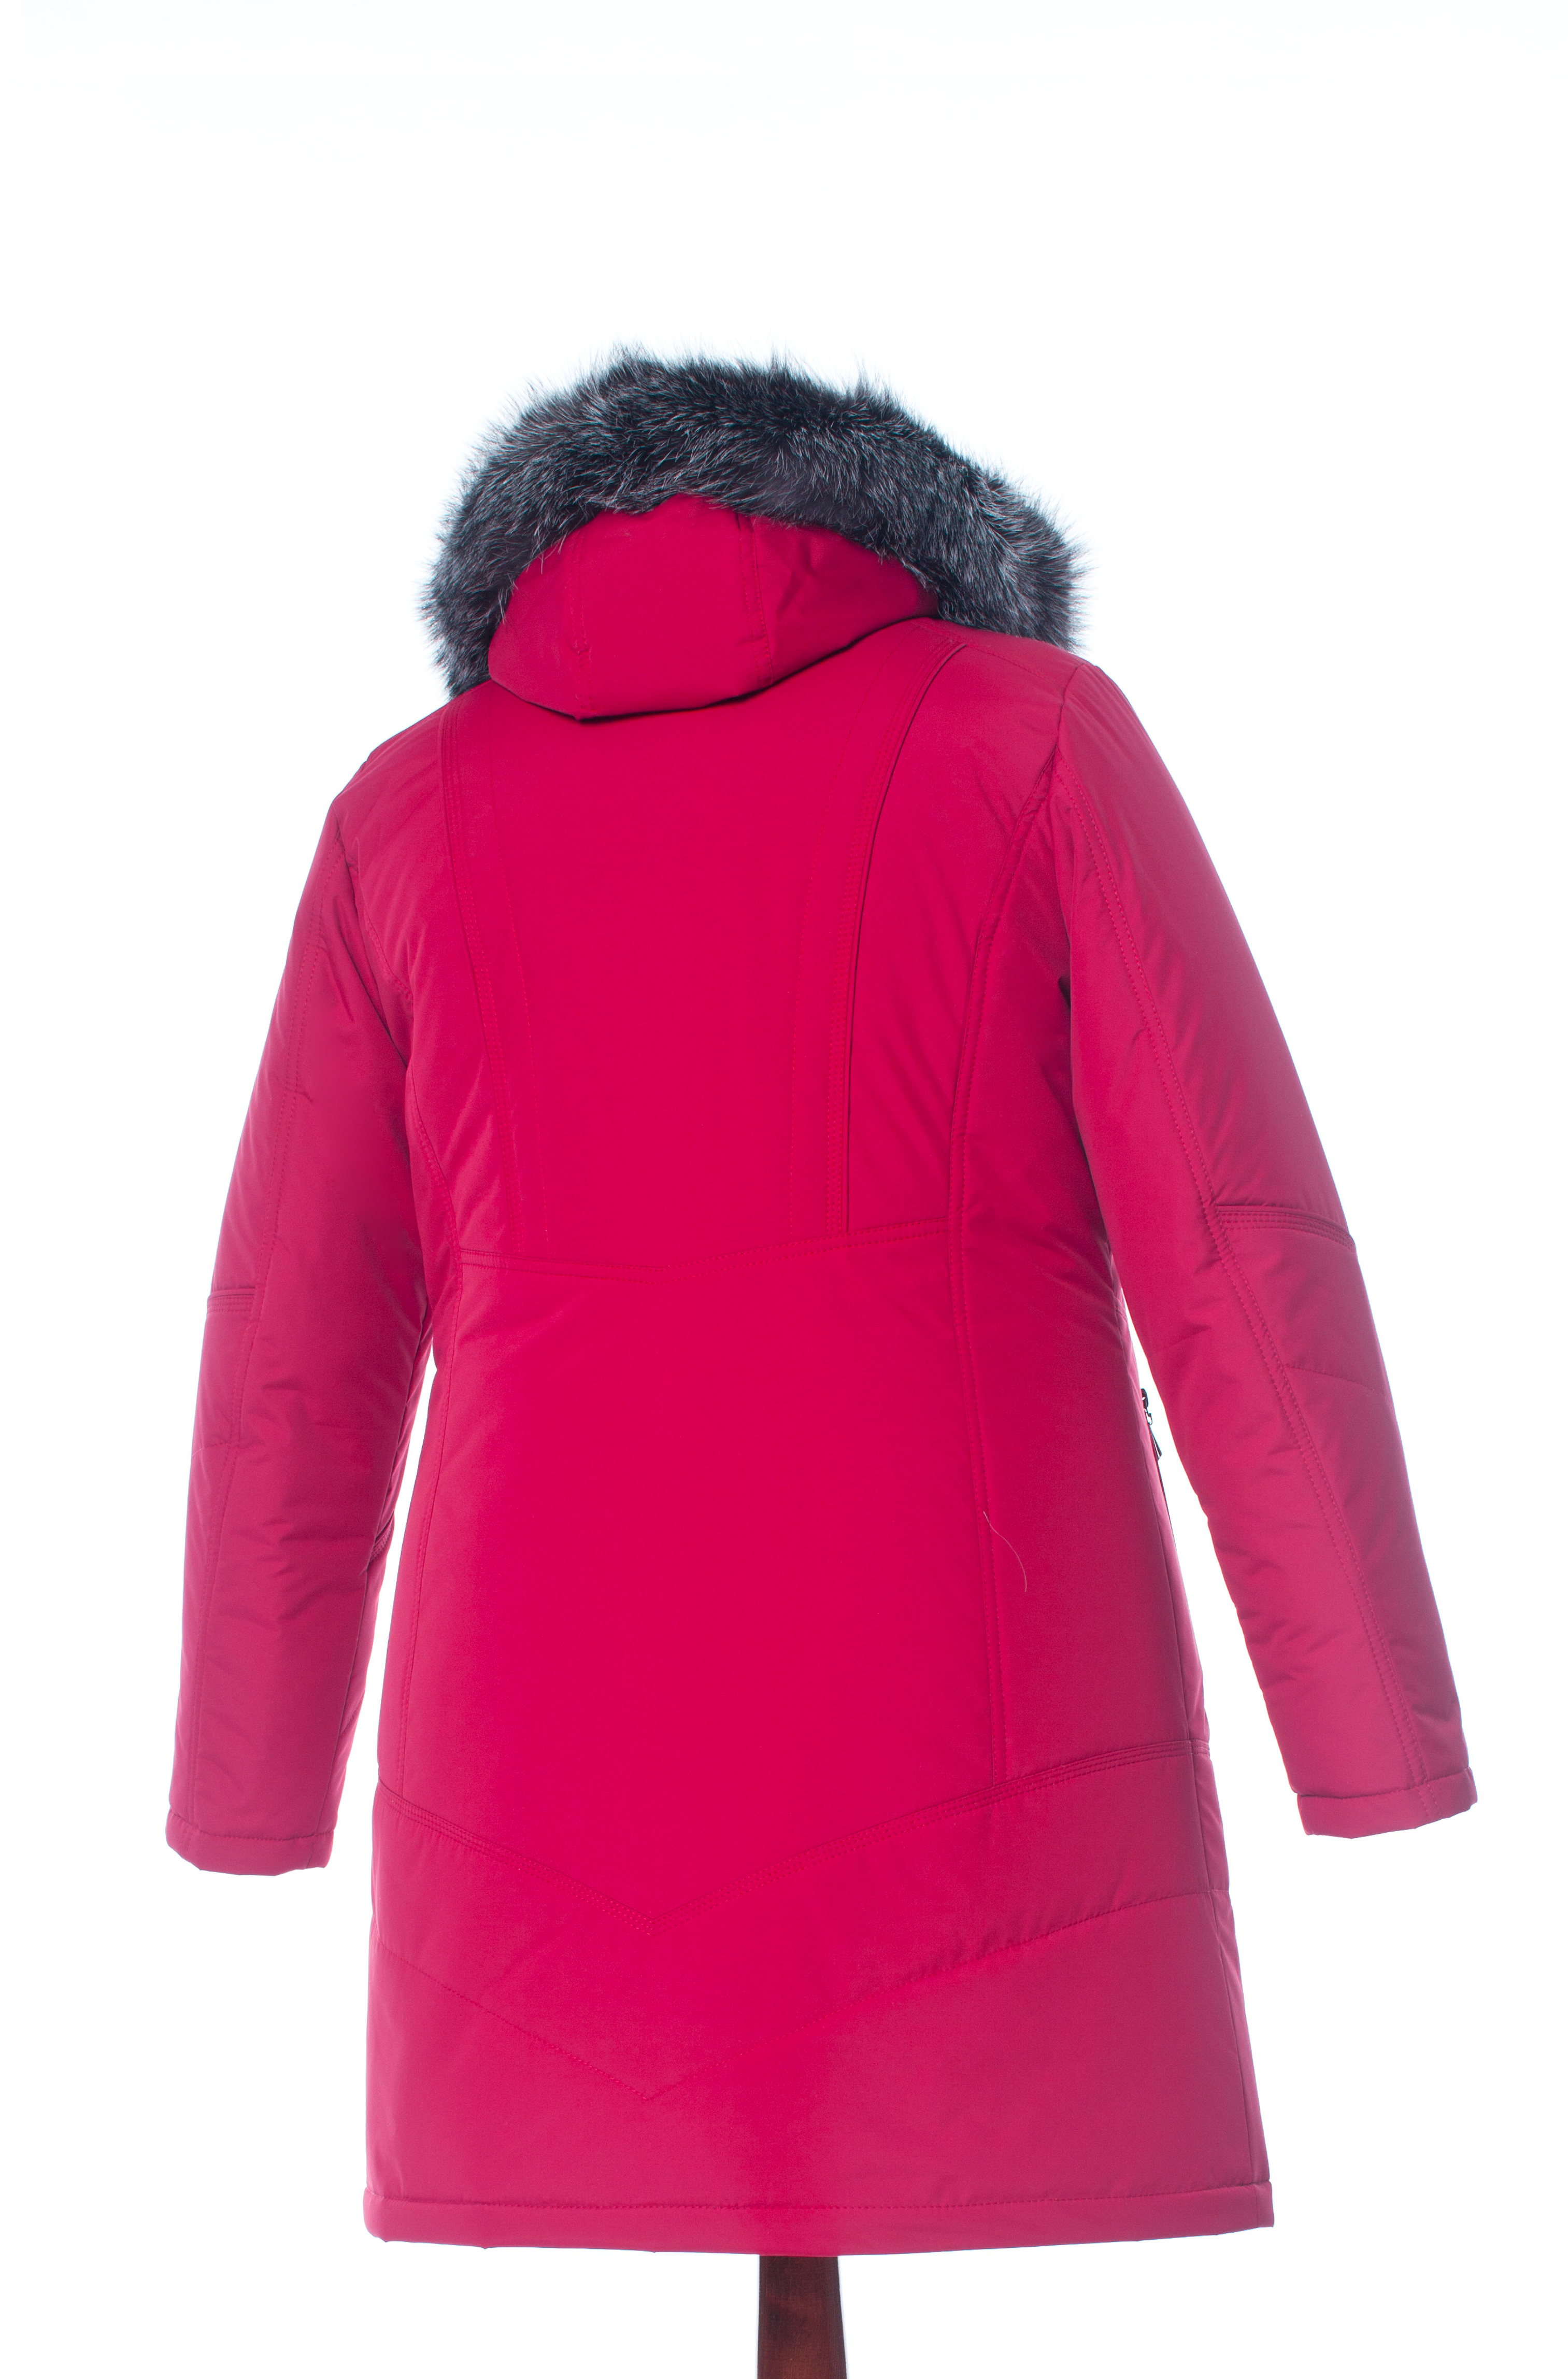 Пальто женское зима 694 Nord Wind — фото 2